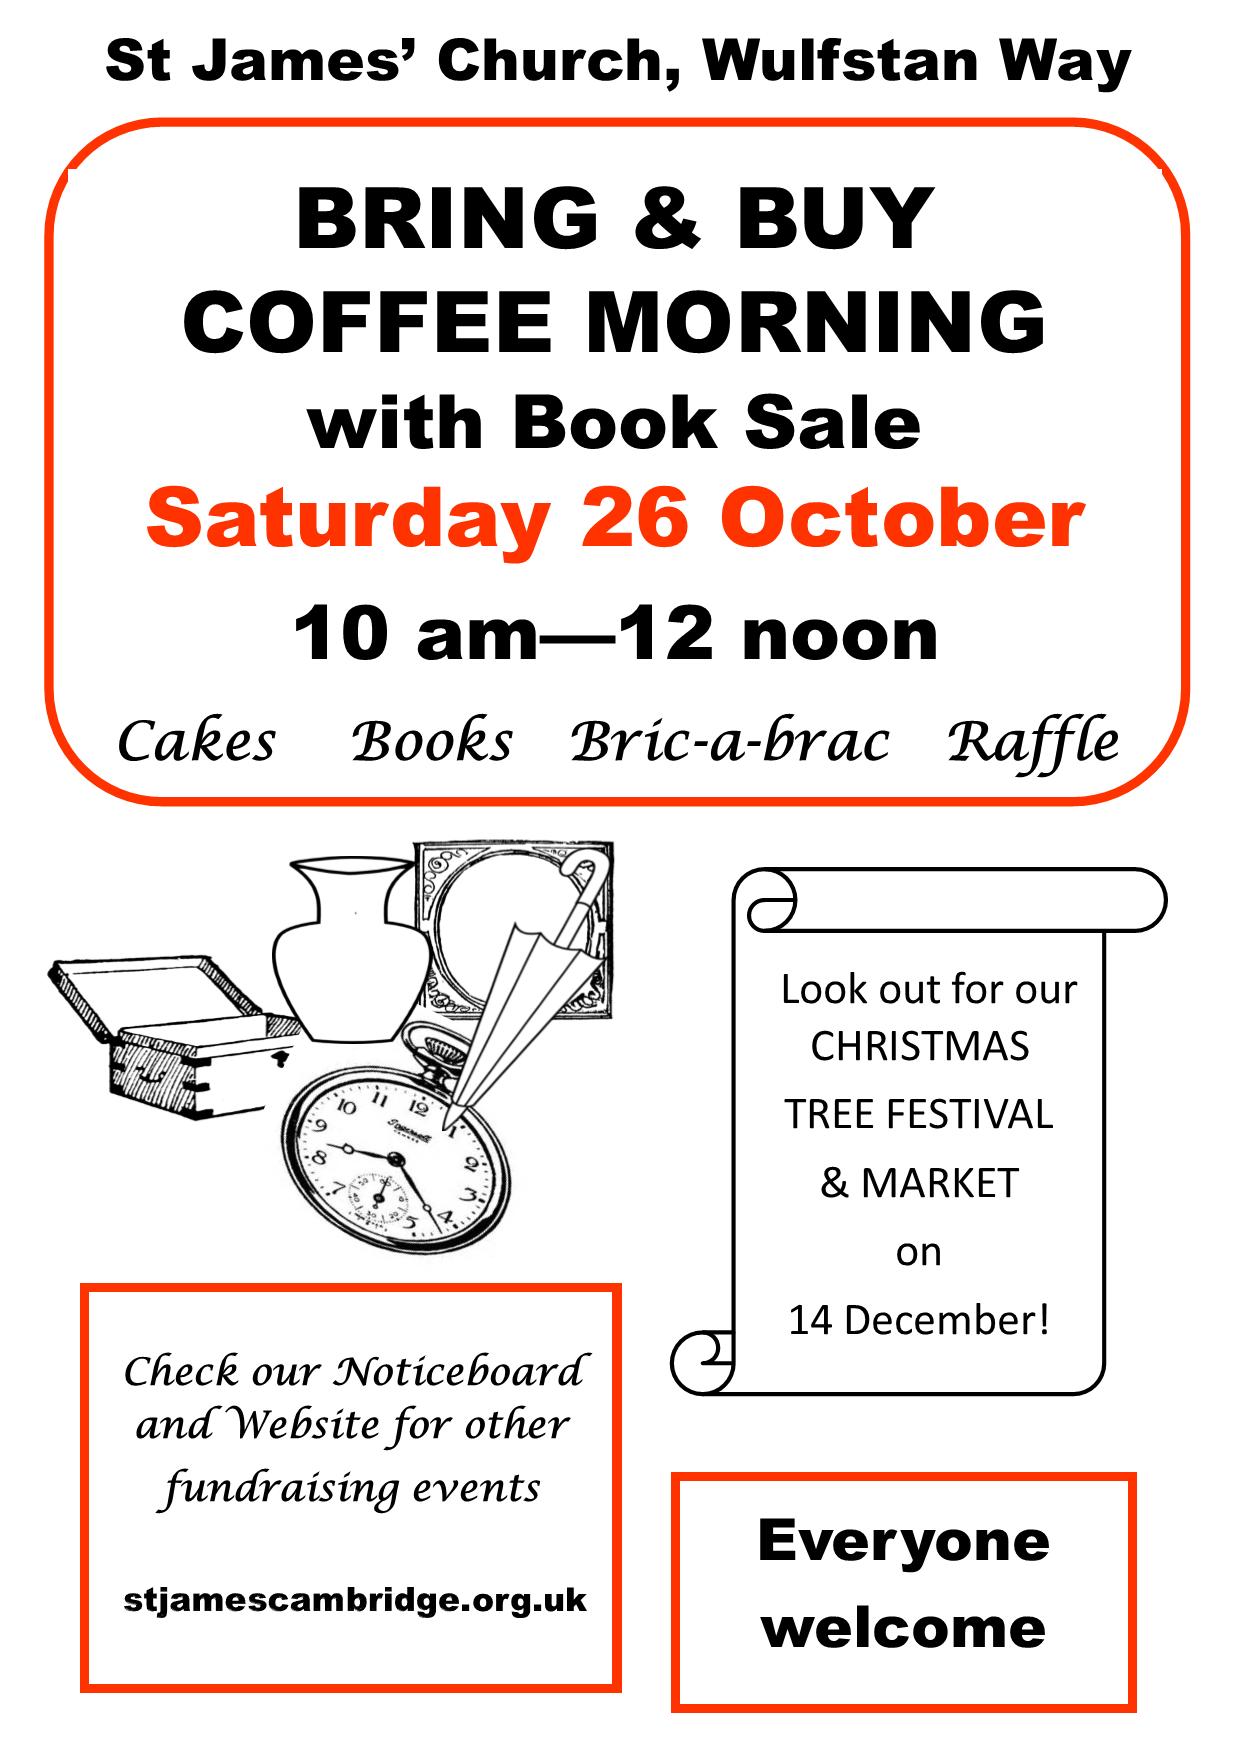 CoffeeMorningPoster, October 2019